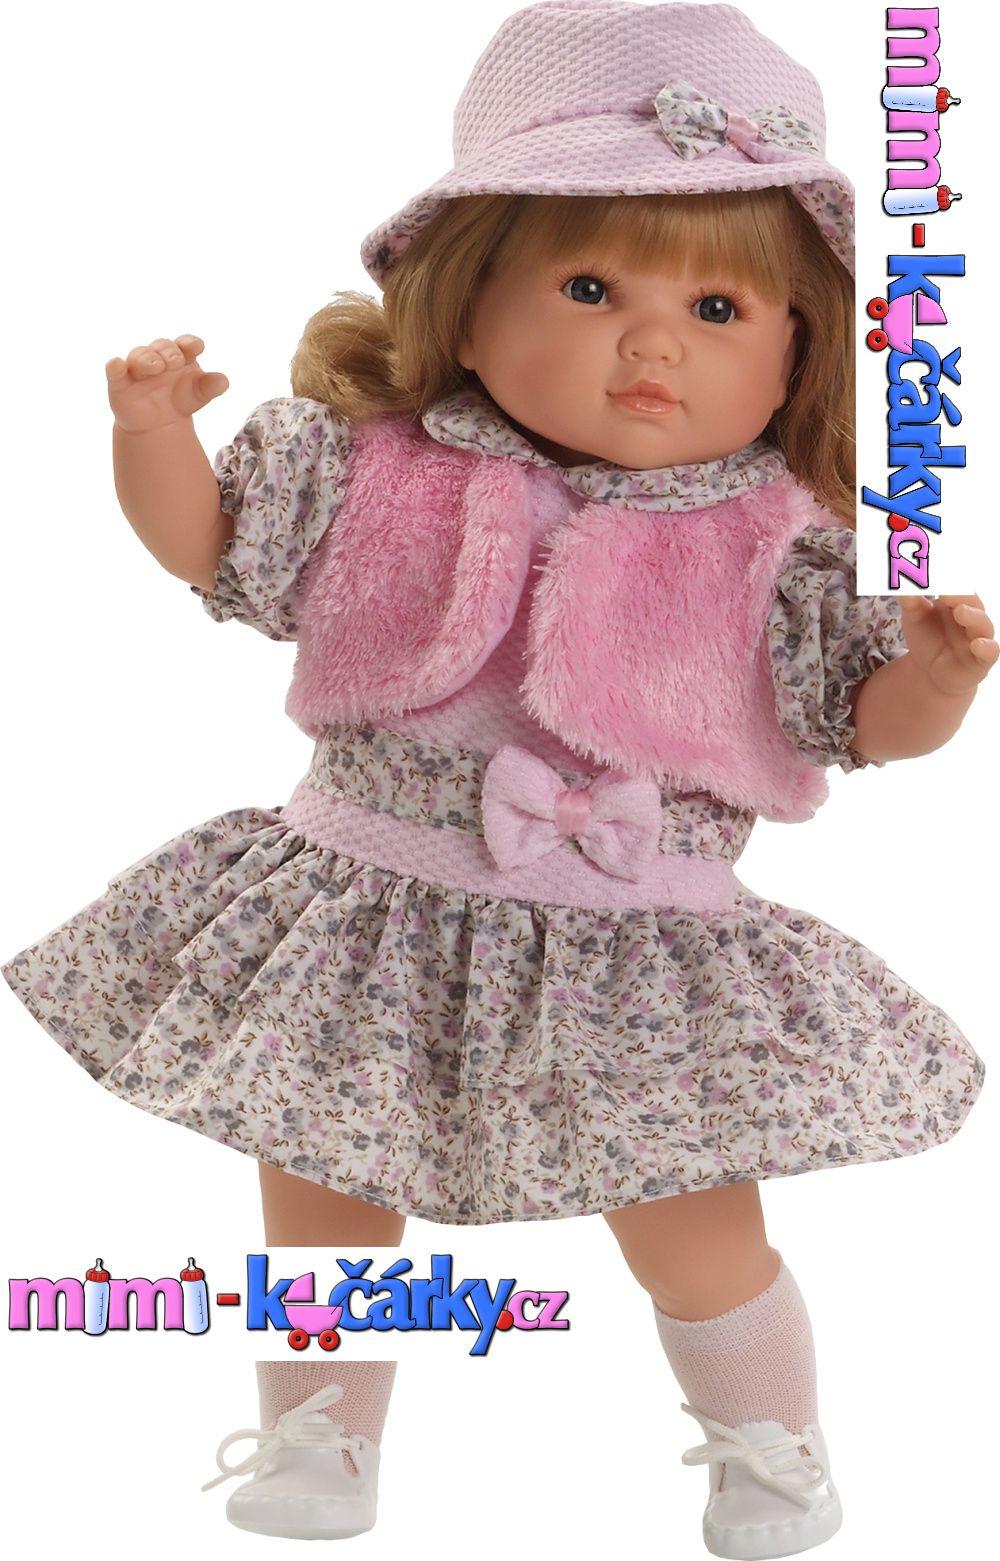 Velká realistická panenka Berbesa Sandra